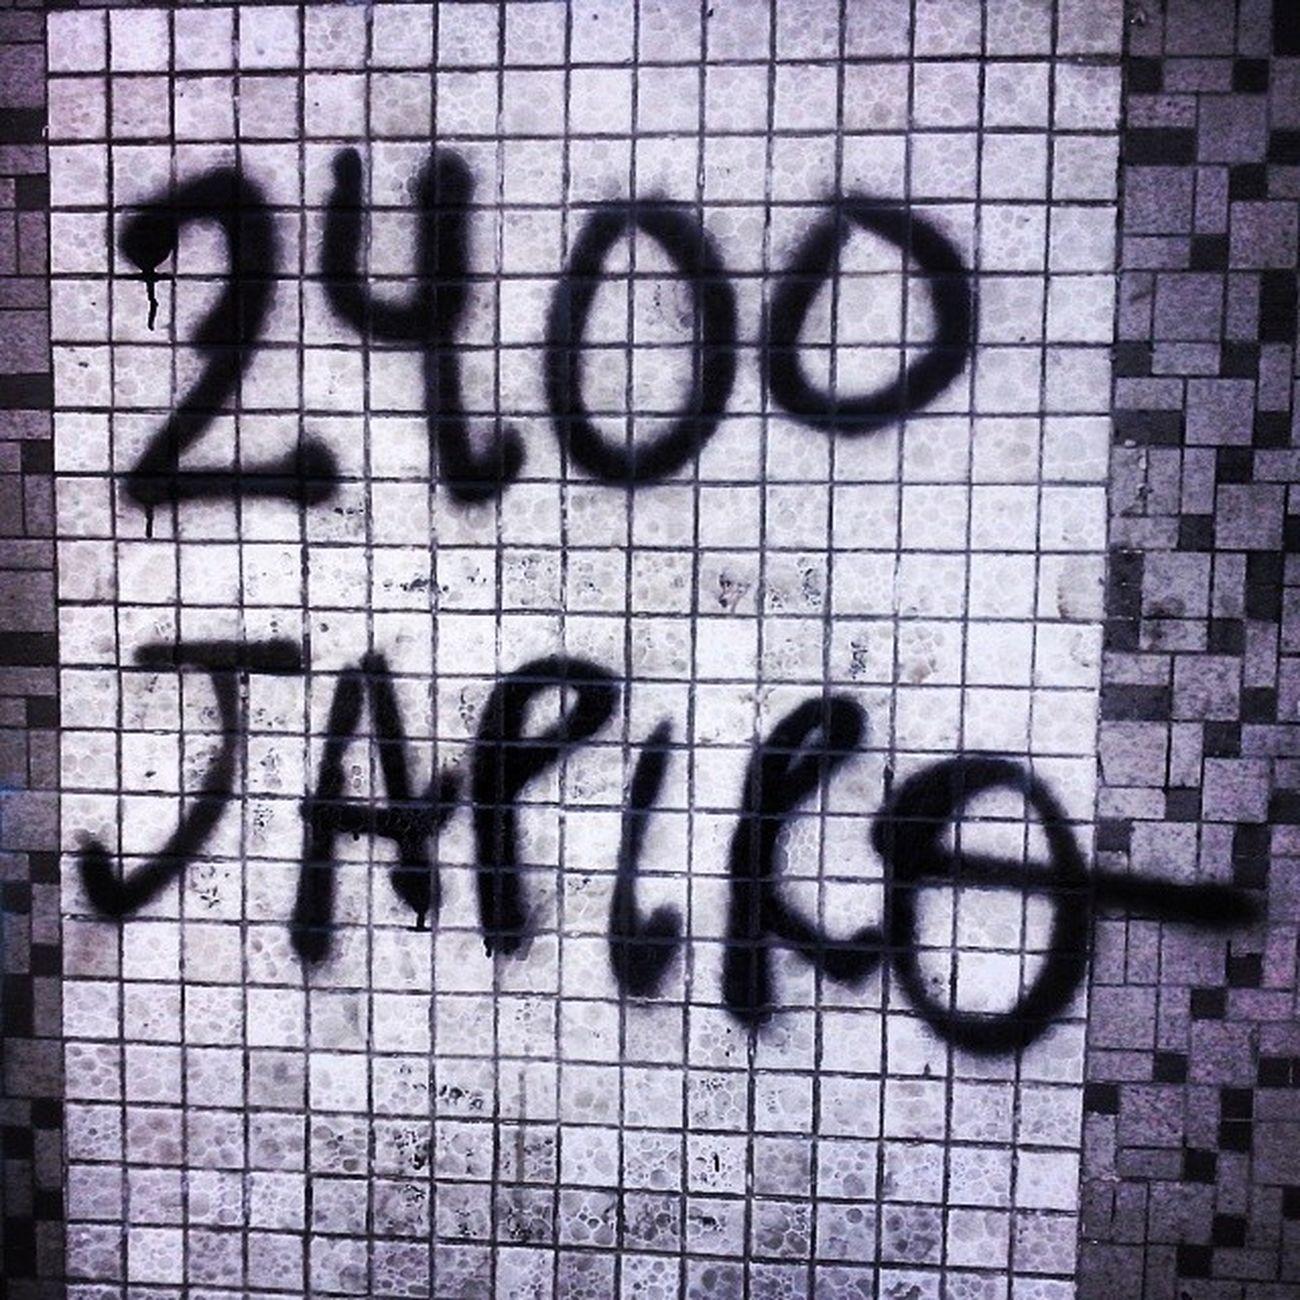 Japiro Streetart Street Streetphotography Tagsforlikes Sprayart Urban UrbanART Urbanwalls Wall Wallporn Graffitiigers Stencilart Art Graffiti Instagraffiti Instagood ArtWork Mural Graffitiporn Photooftheday Stencil Streetartistry Stickerart Pasteup instagraff instagrafite